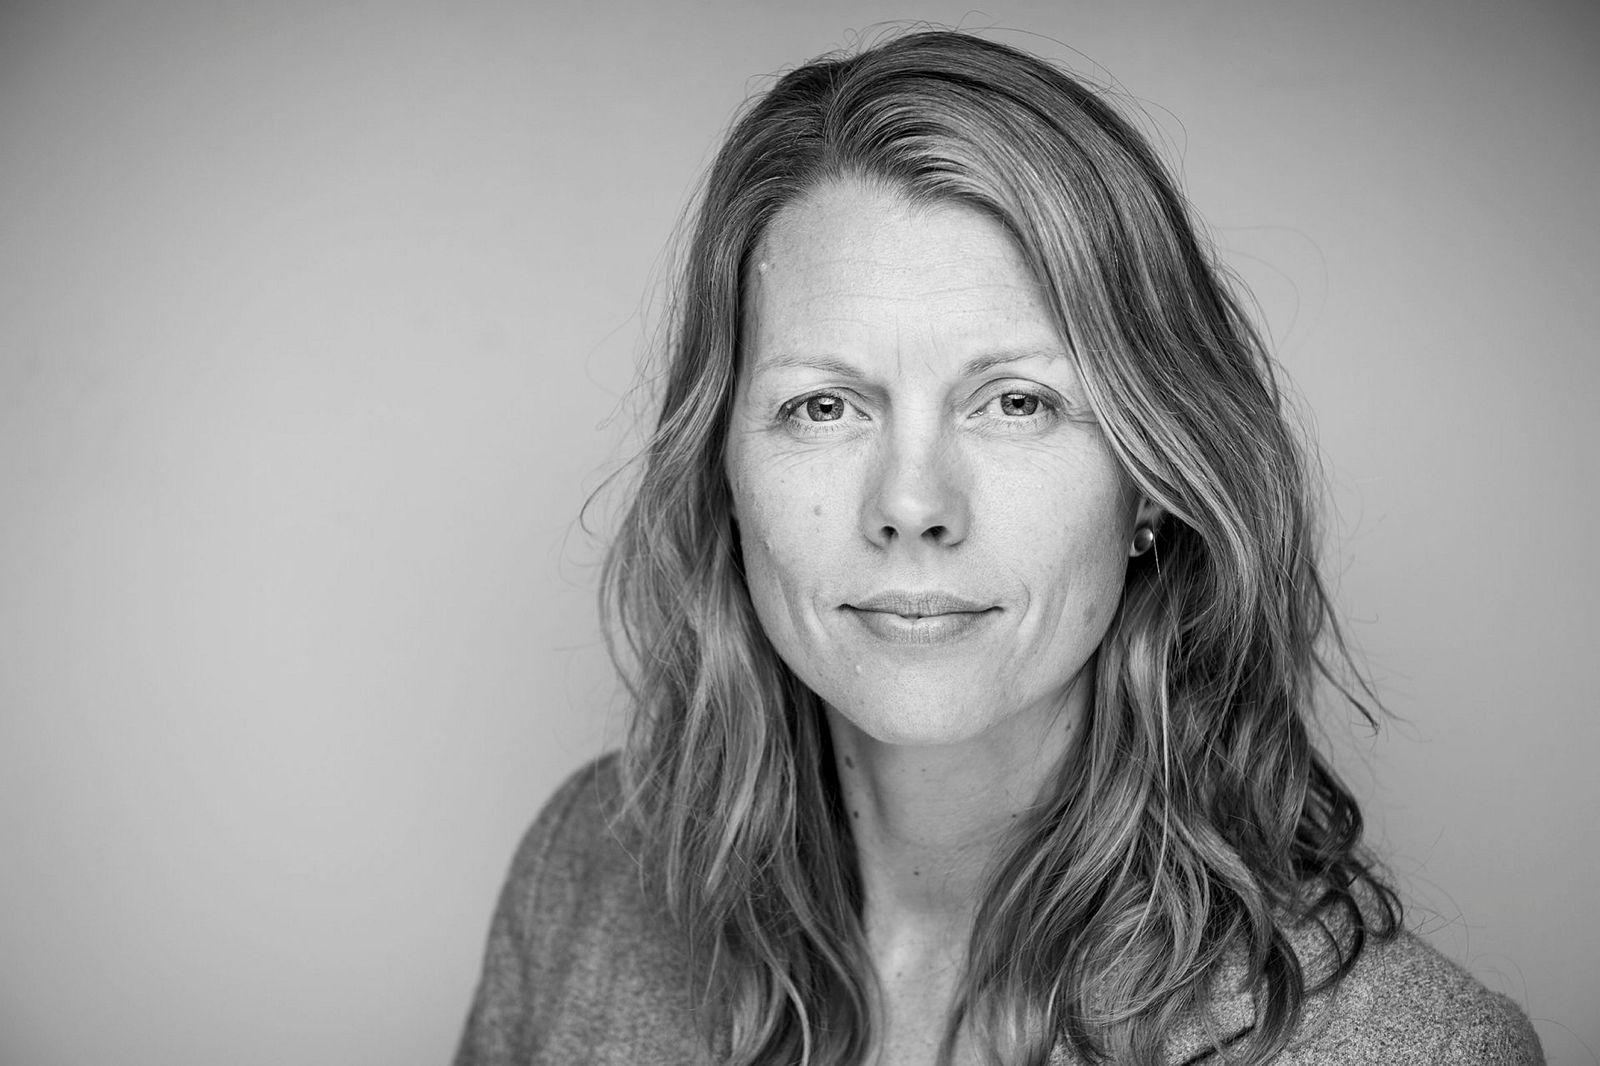 Gro Sandkjær Hanssen